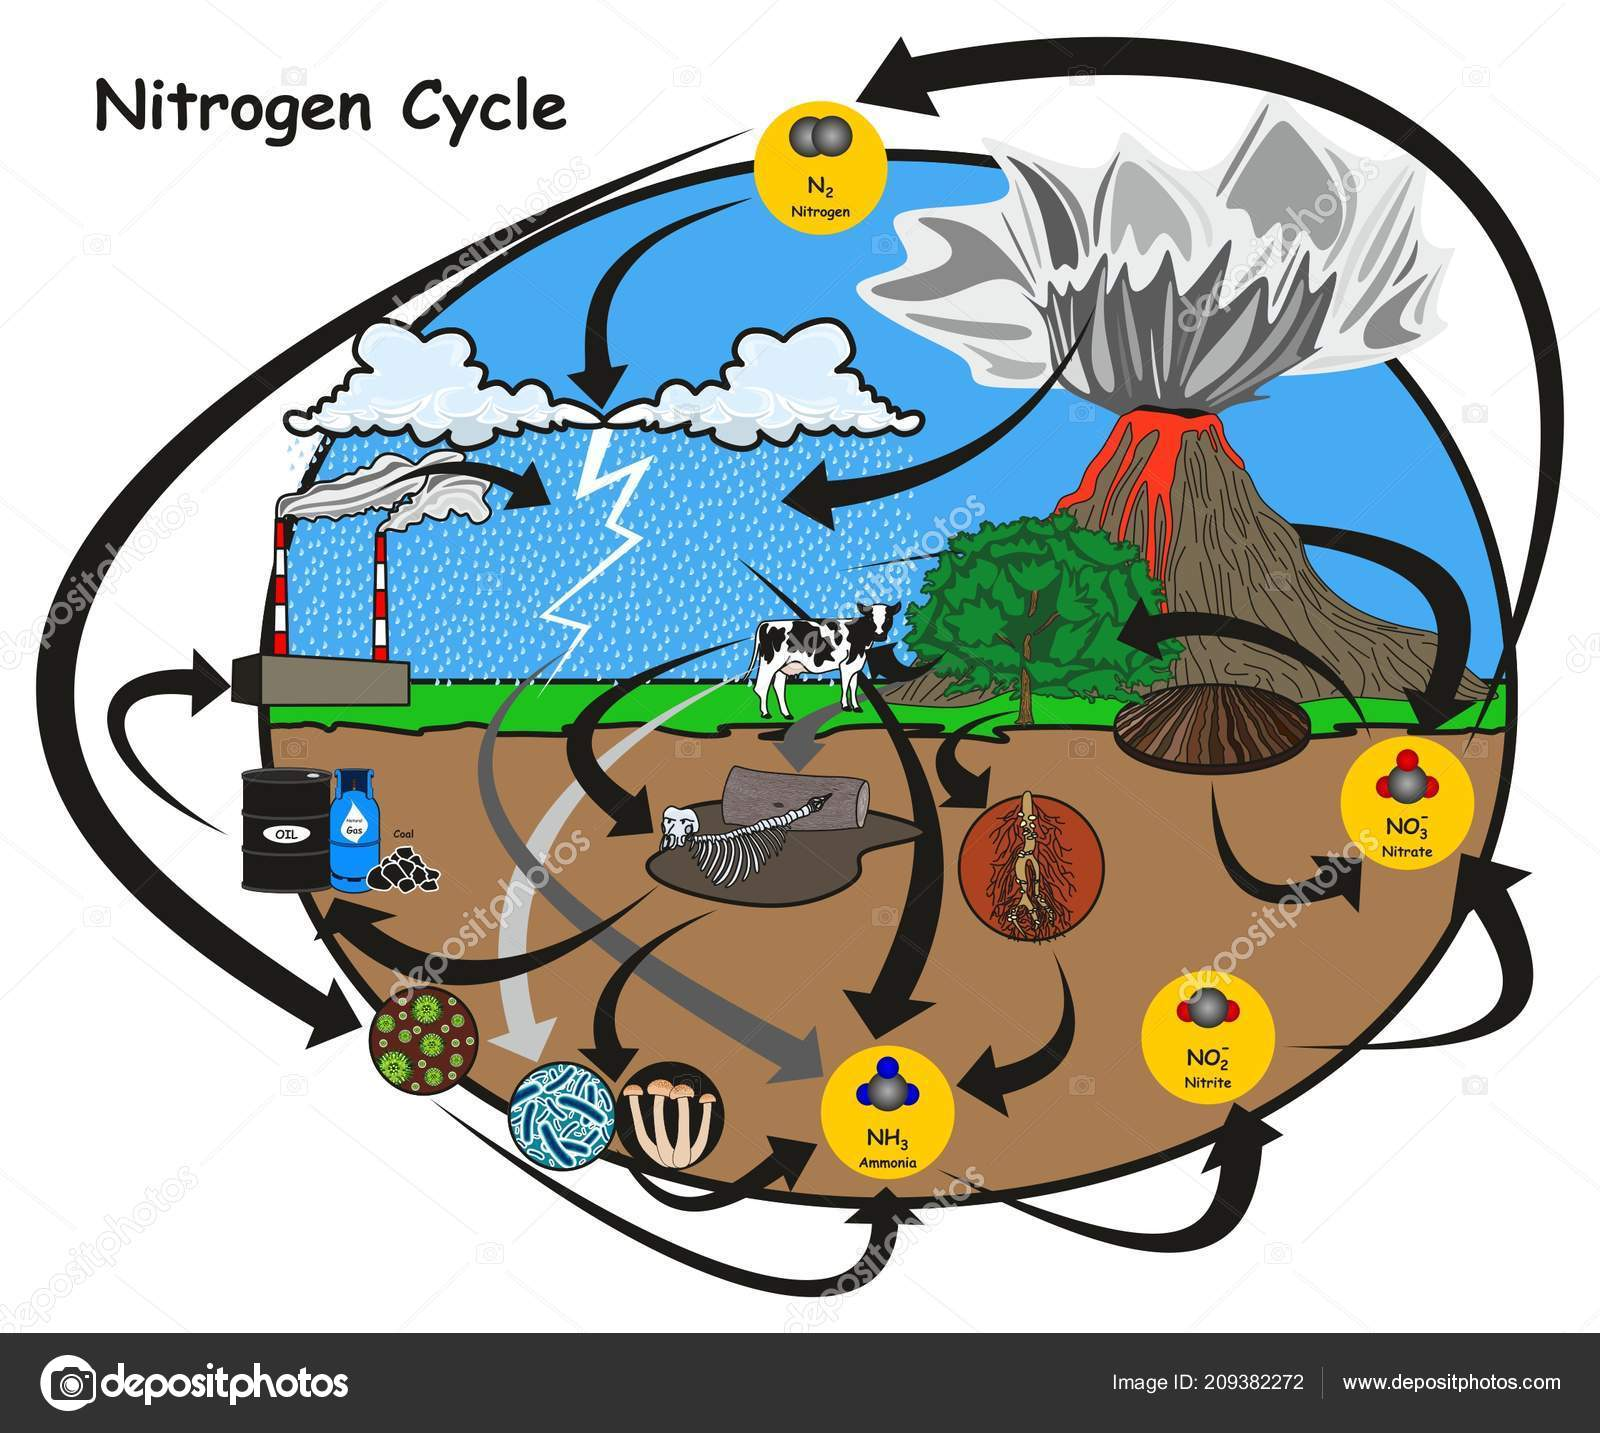 Nitrogen cycle infographic diagram showing how nitrogen circulation nitrogen cycle infographic diagram showing how nitrogen circulation human environment vetores de stock ccuart Gallery